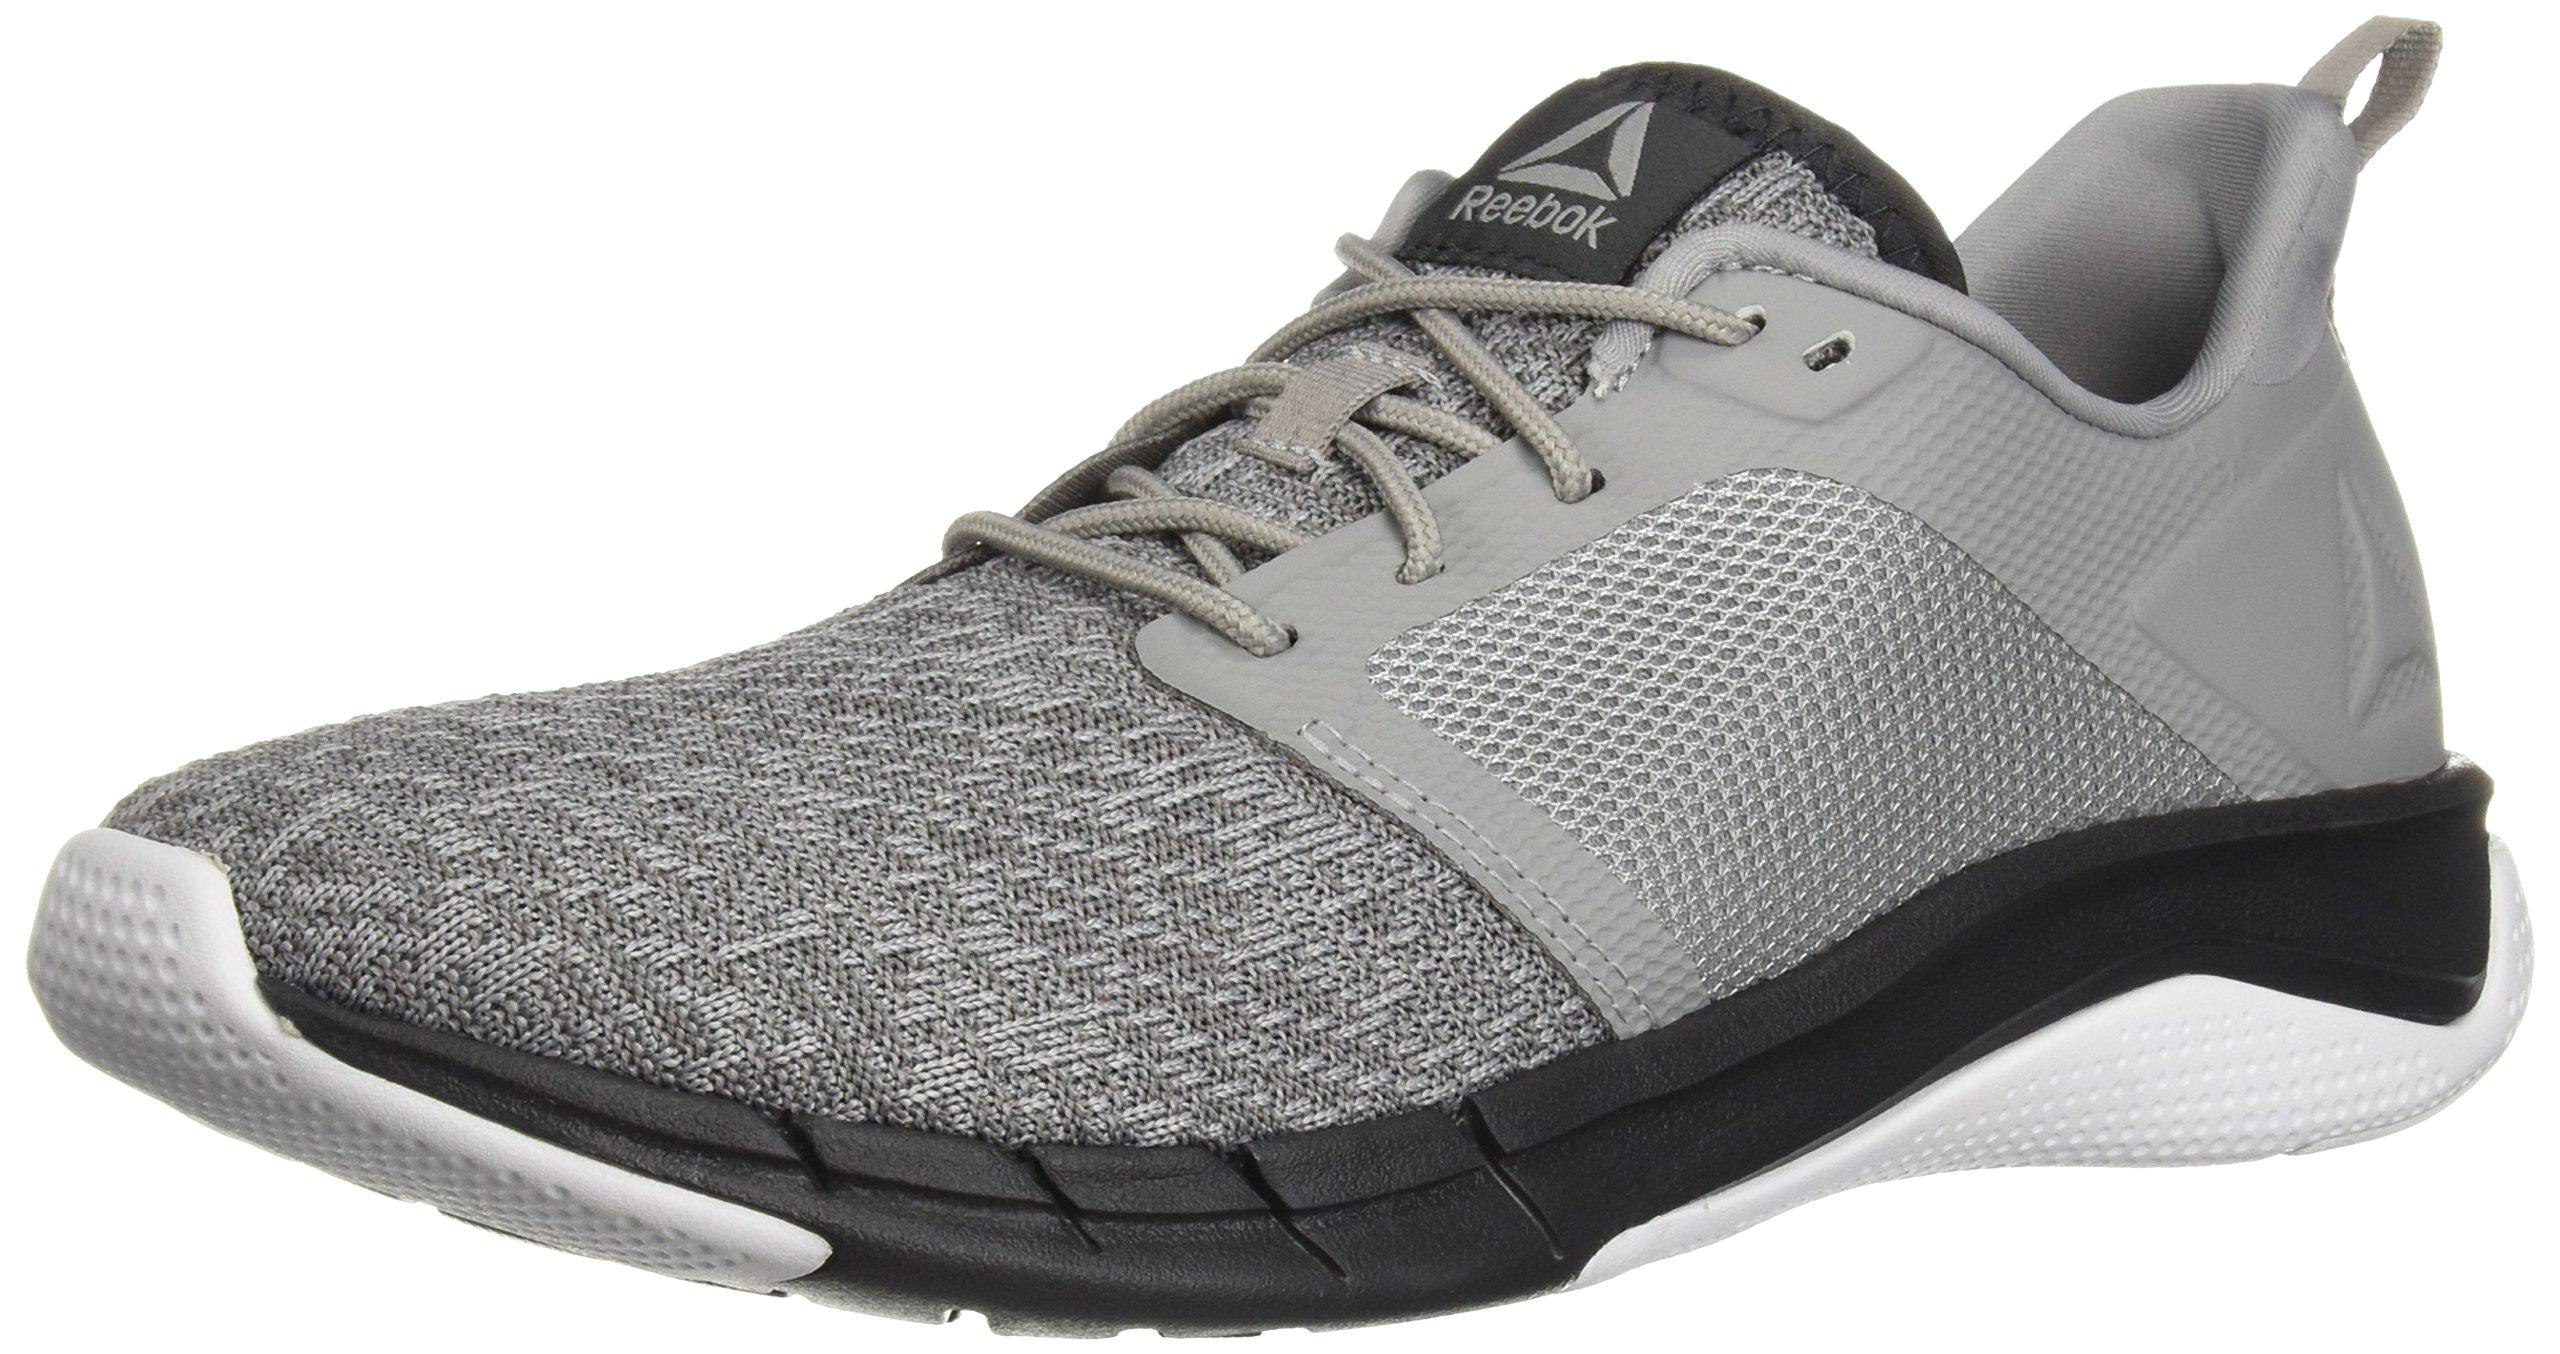 442818769d Reebok Men's Print Run 3.0 Shoe,tin grey/foggy grey/coal,7 M US